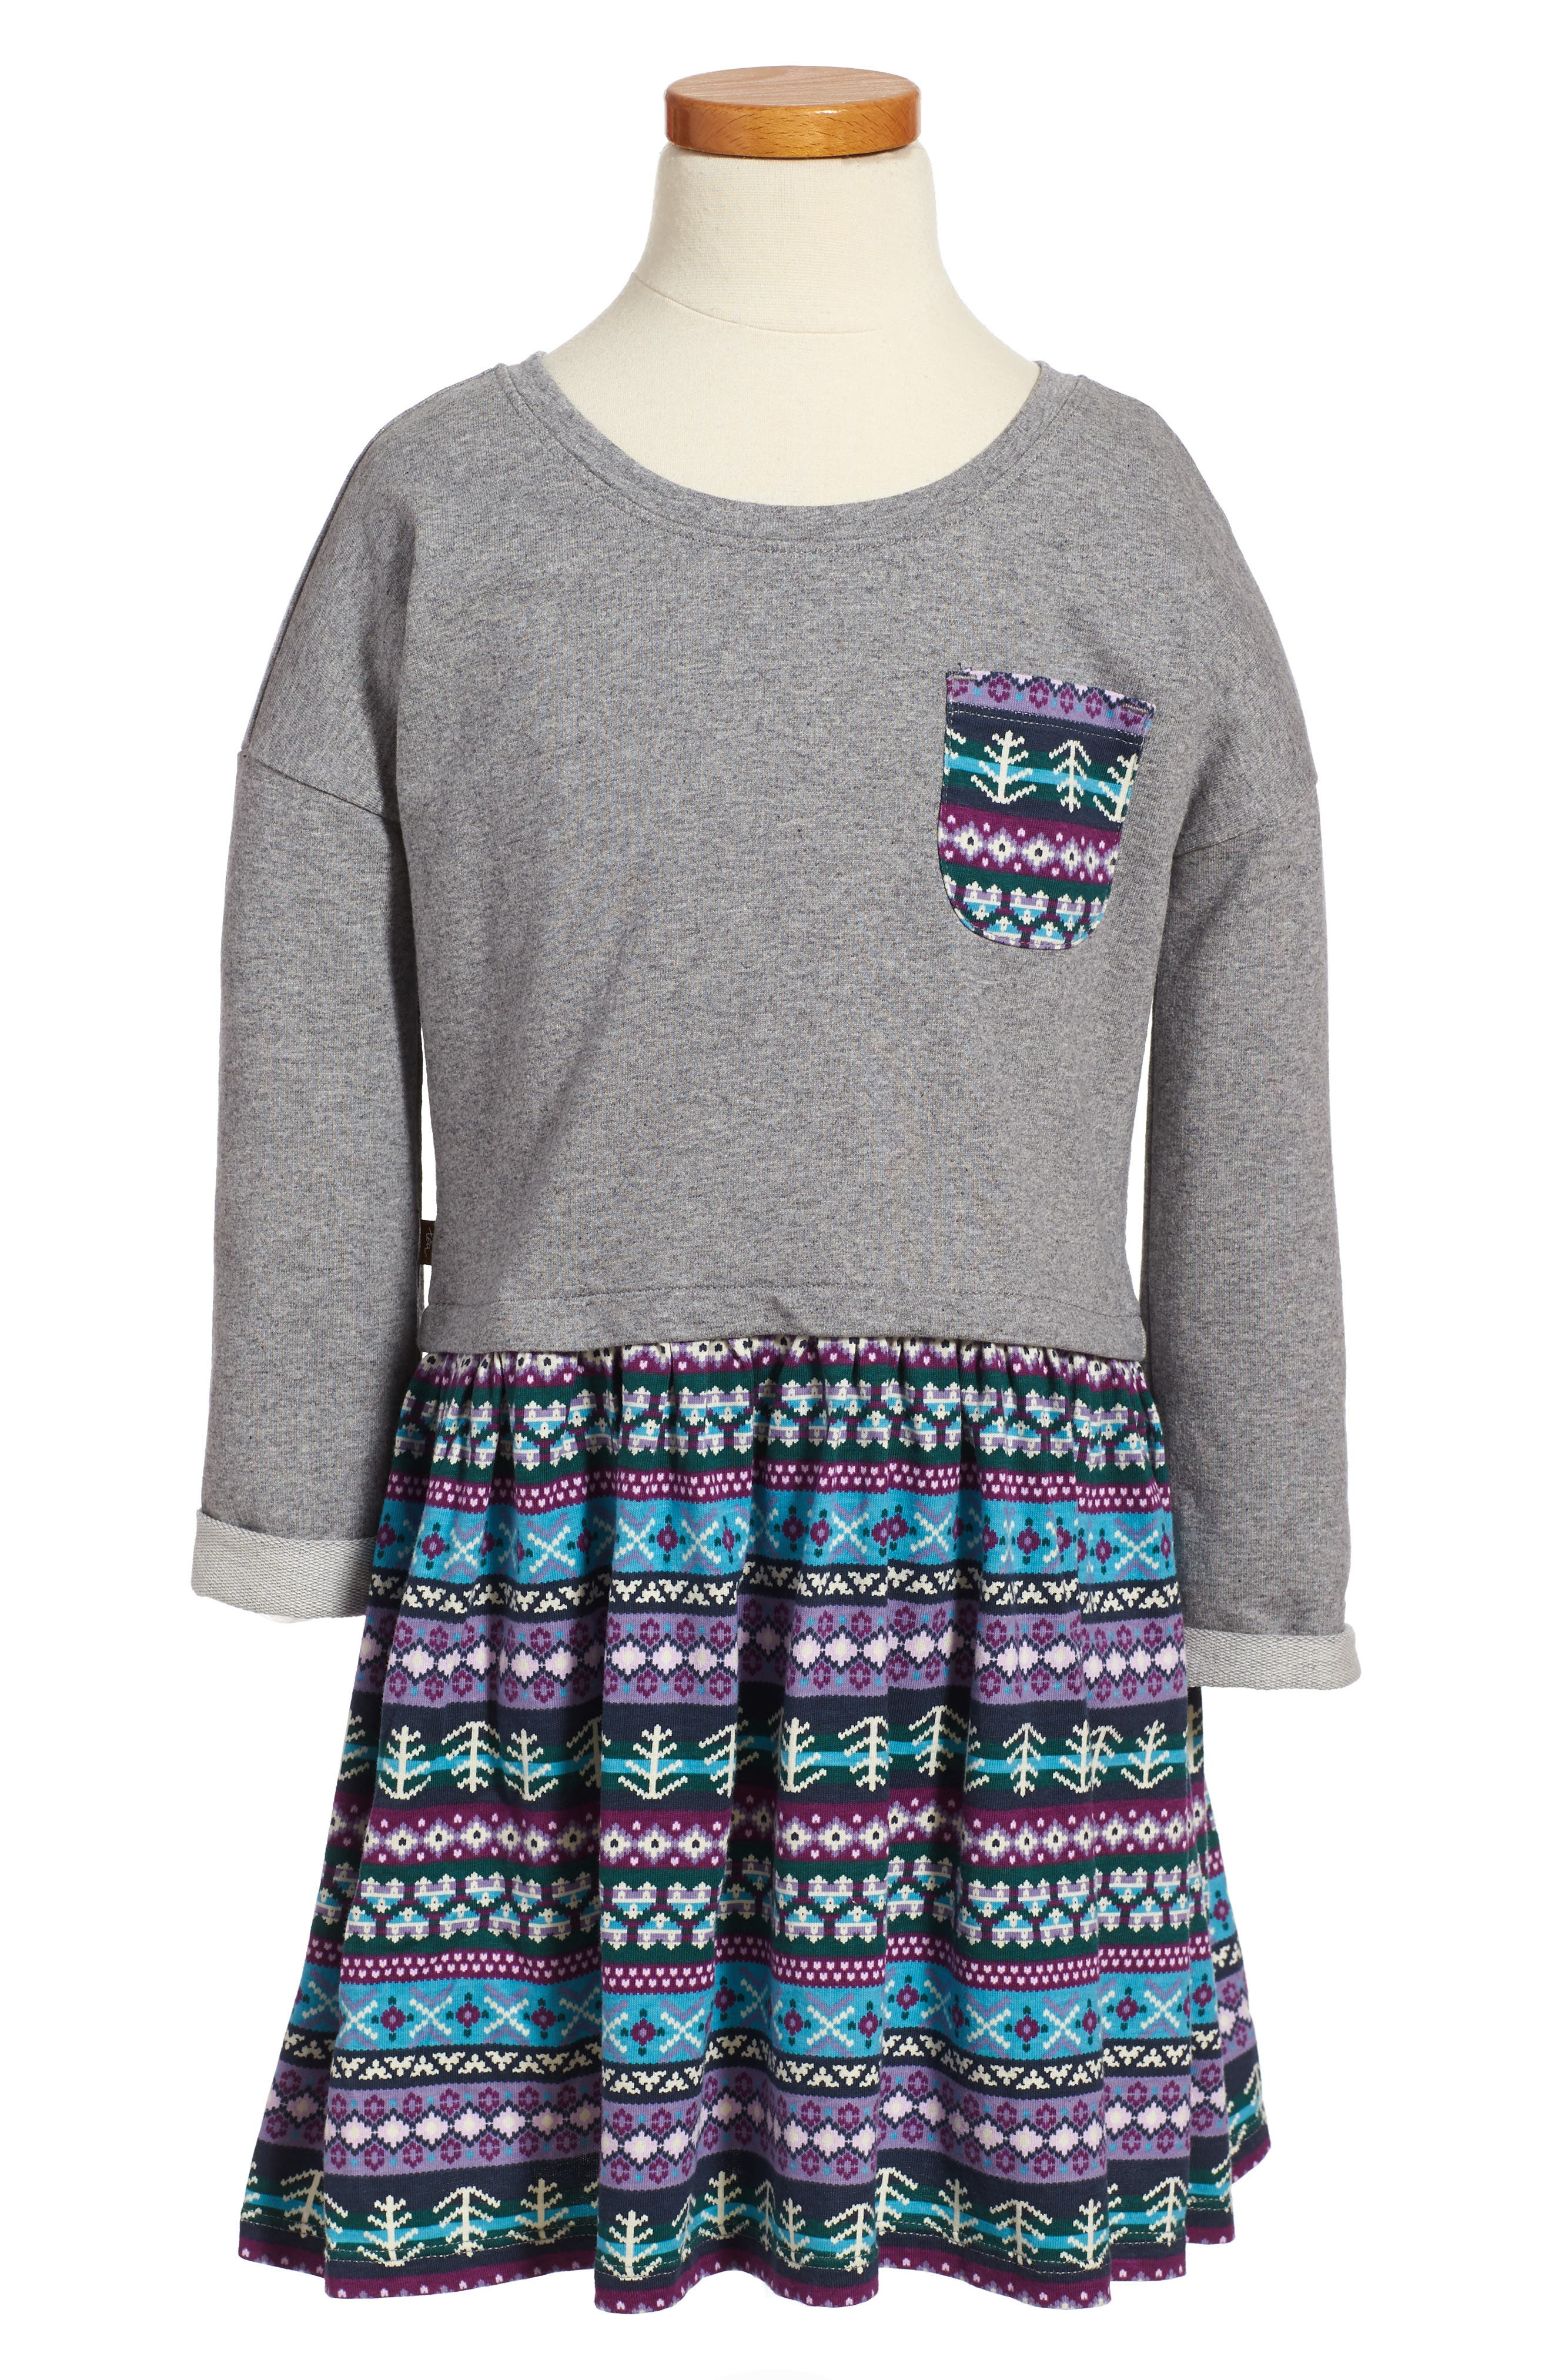 Alternate Image 1 Selected - Tea Collection Islay Dress (Toddler Girls, Little Girls & Big Girls)